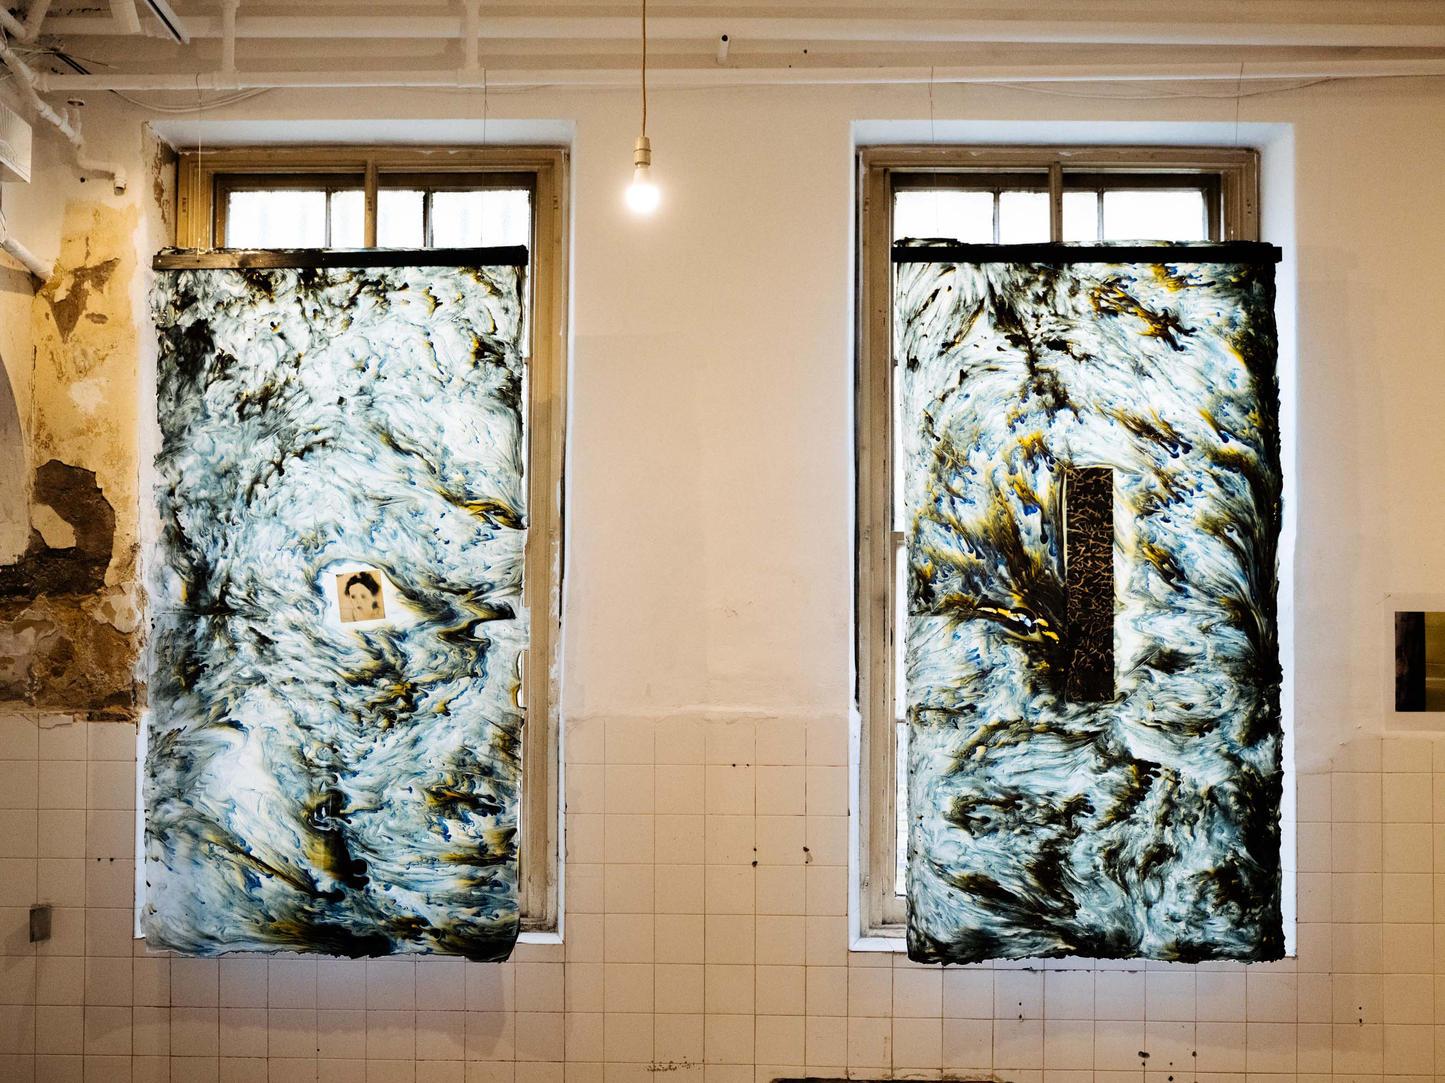 20200910_TheEdge_InstallationShots-46.jp